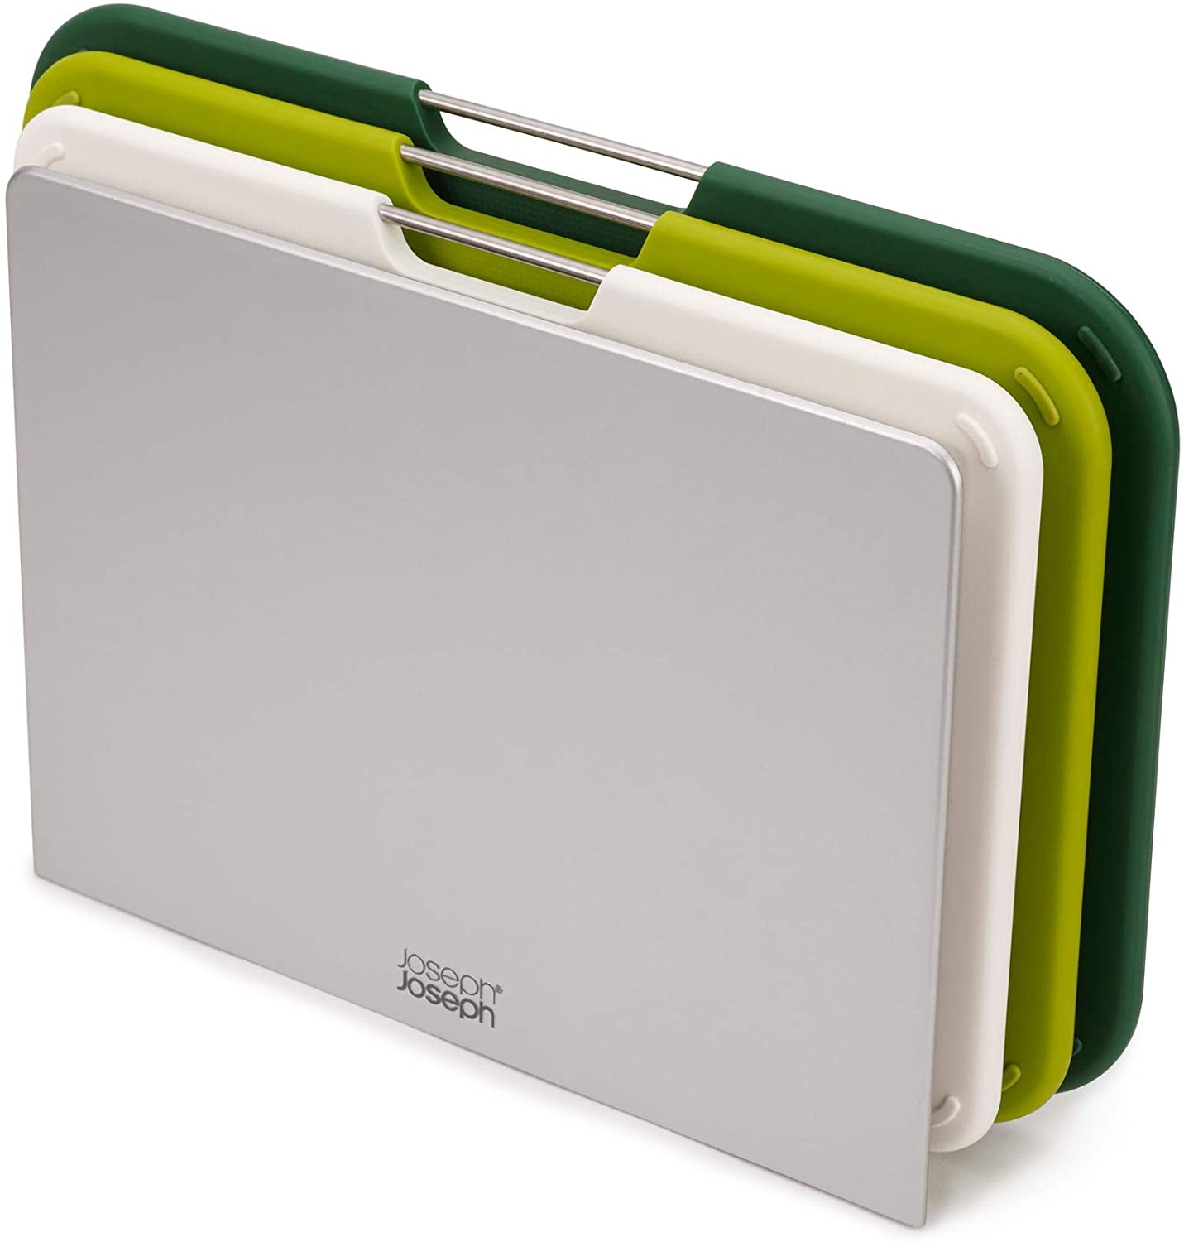 Joseph Joseph(ジョセフジョセフ) ネストボード まな板セット グリーンの商品画像